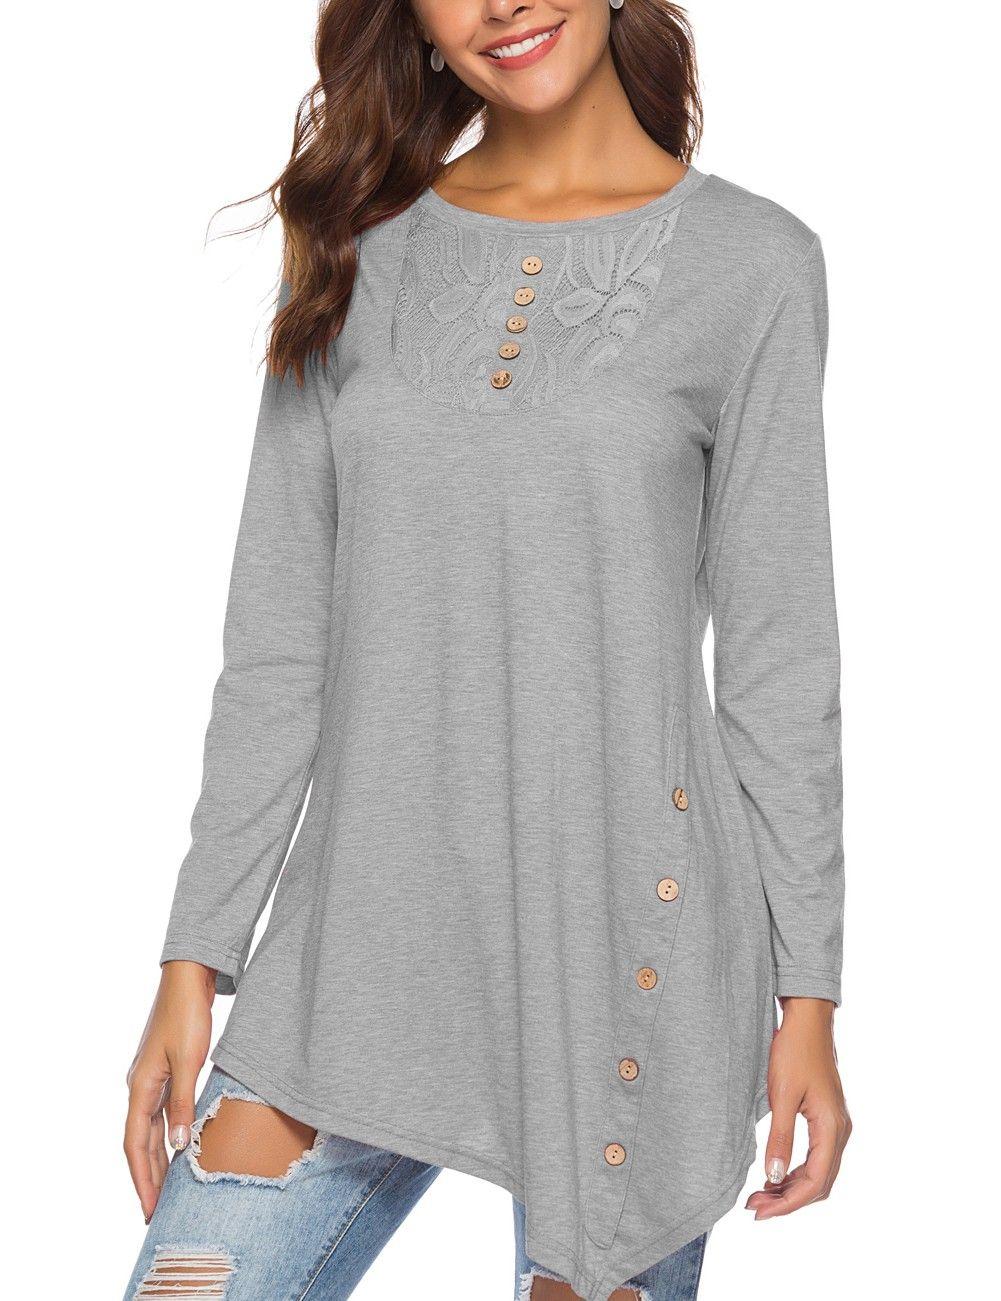 aa6d38e399fc1f Royal Grey Lace Stiching Shirt Long Sleeve Stretch in 2019